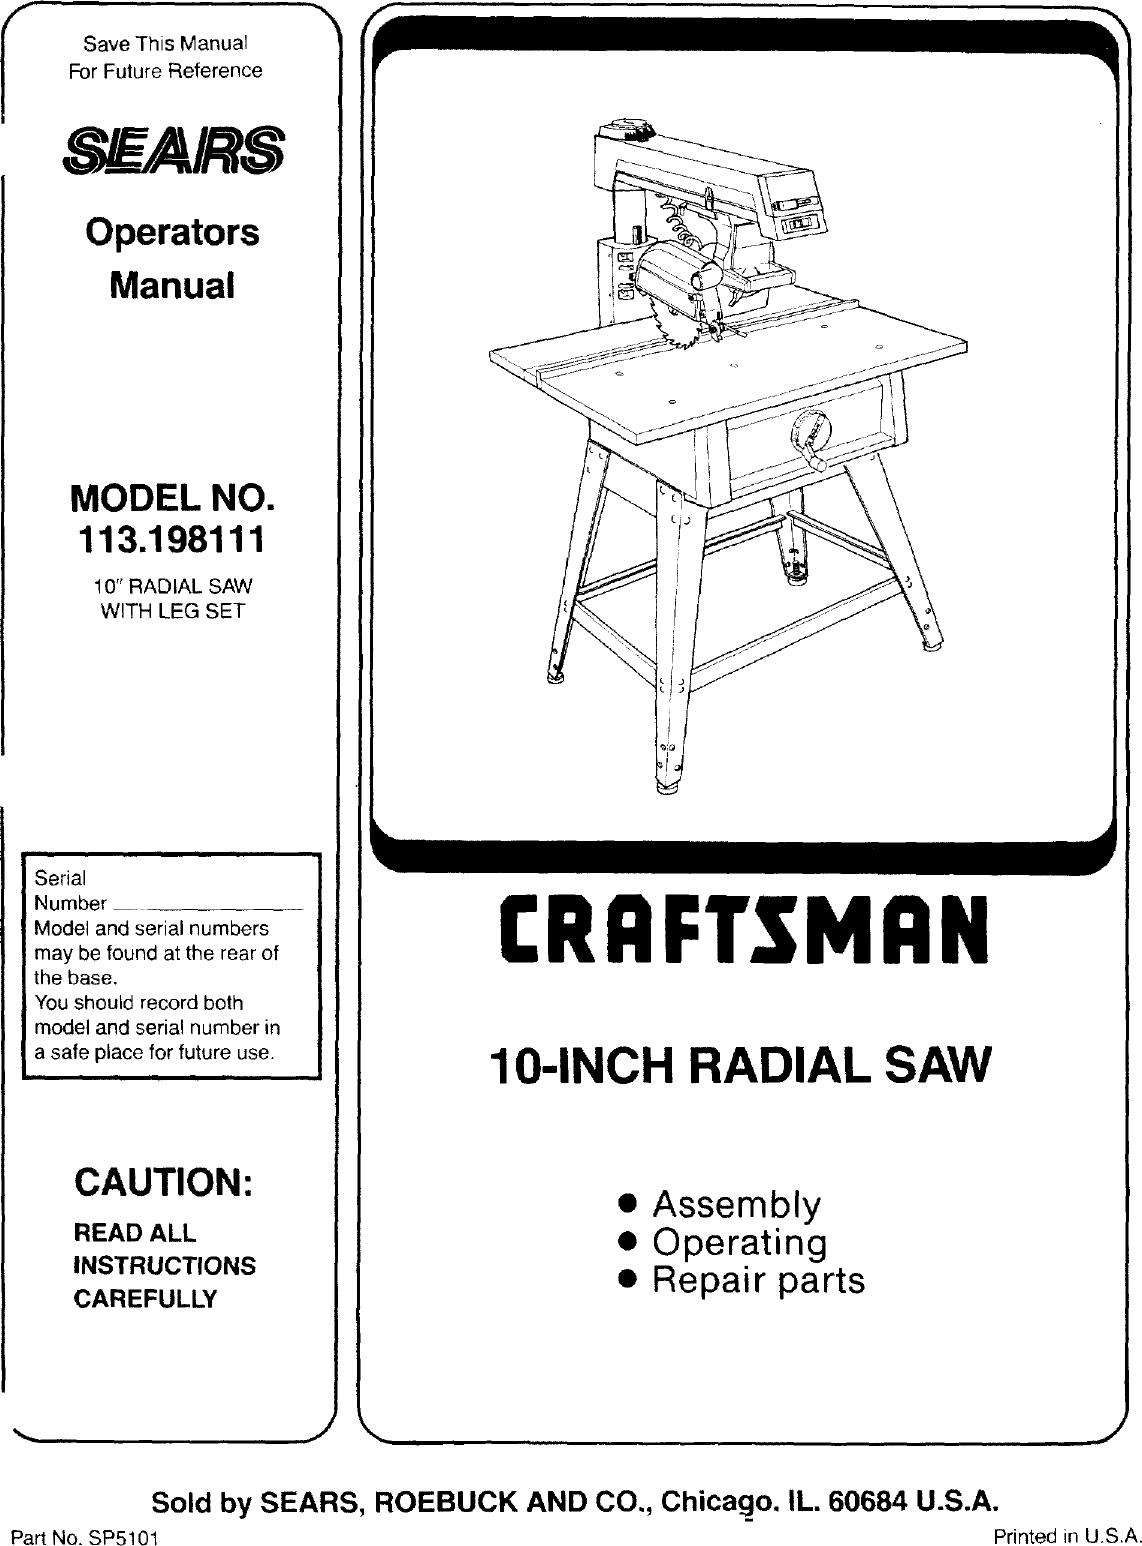 Craftsman 113198111 User Manual 10 INCH RADIAL SAW Manuals